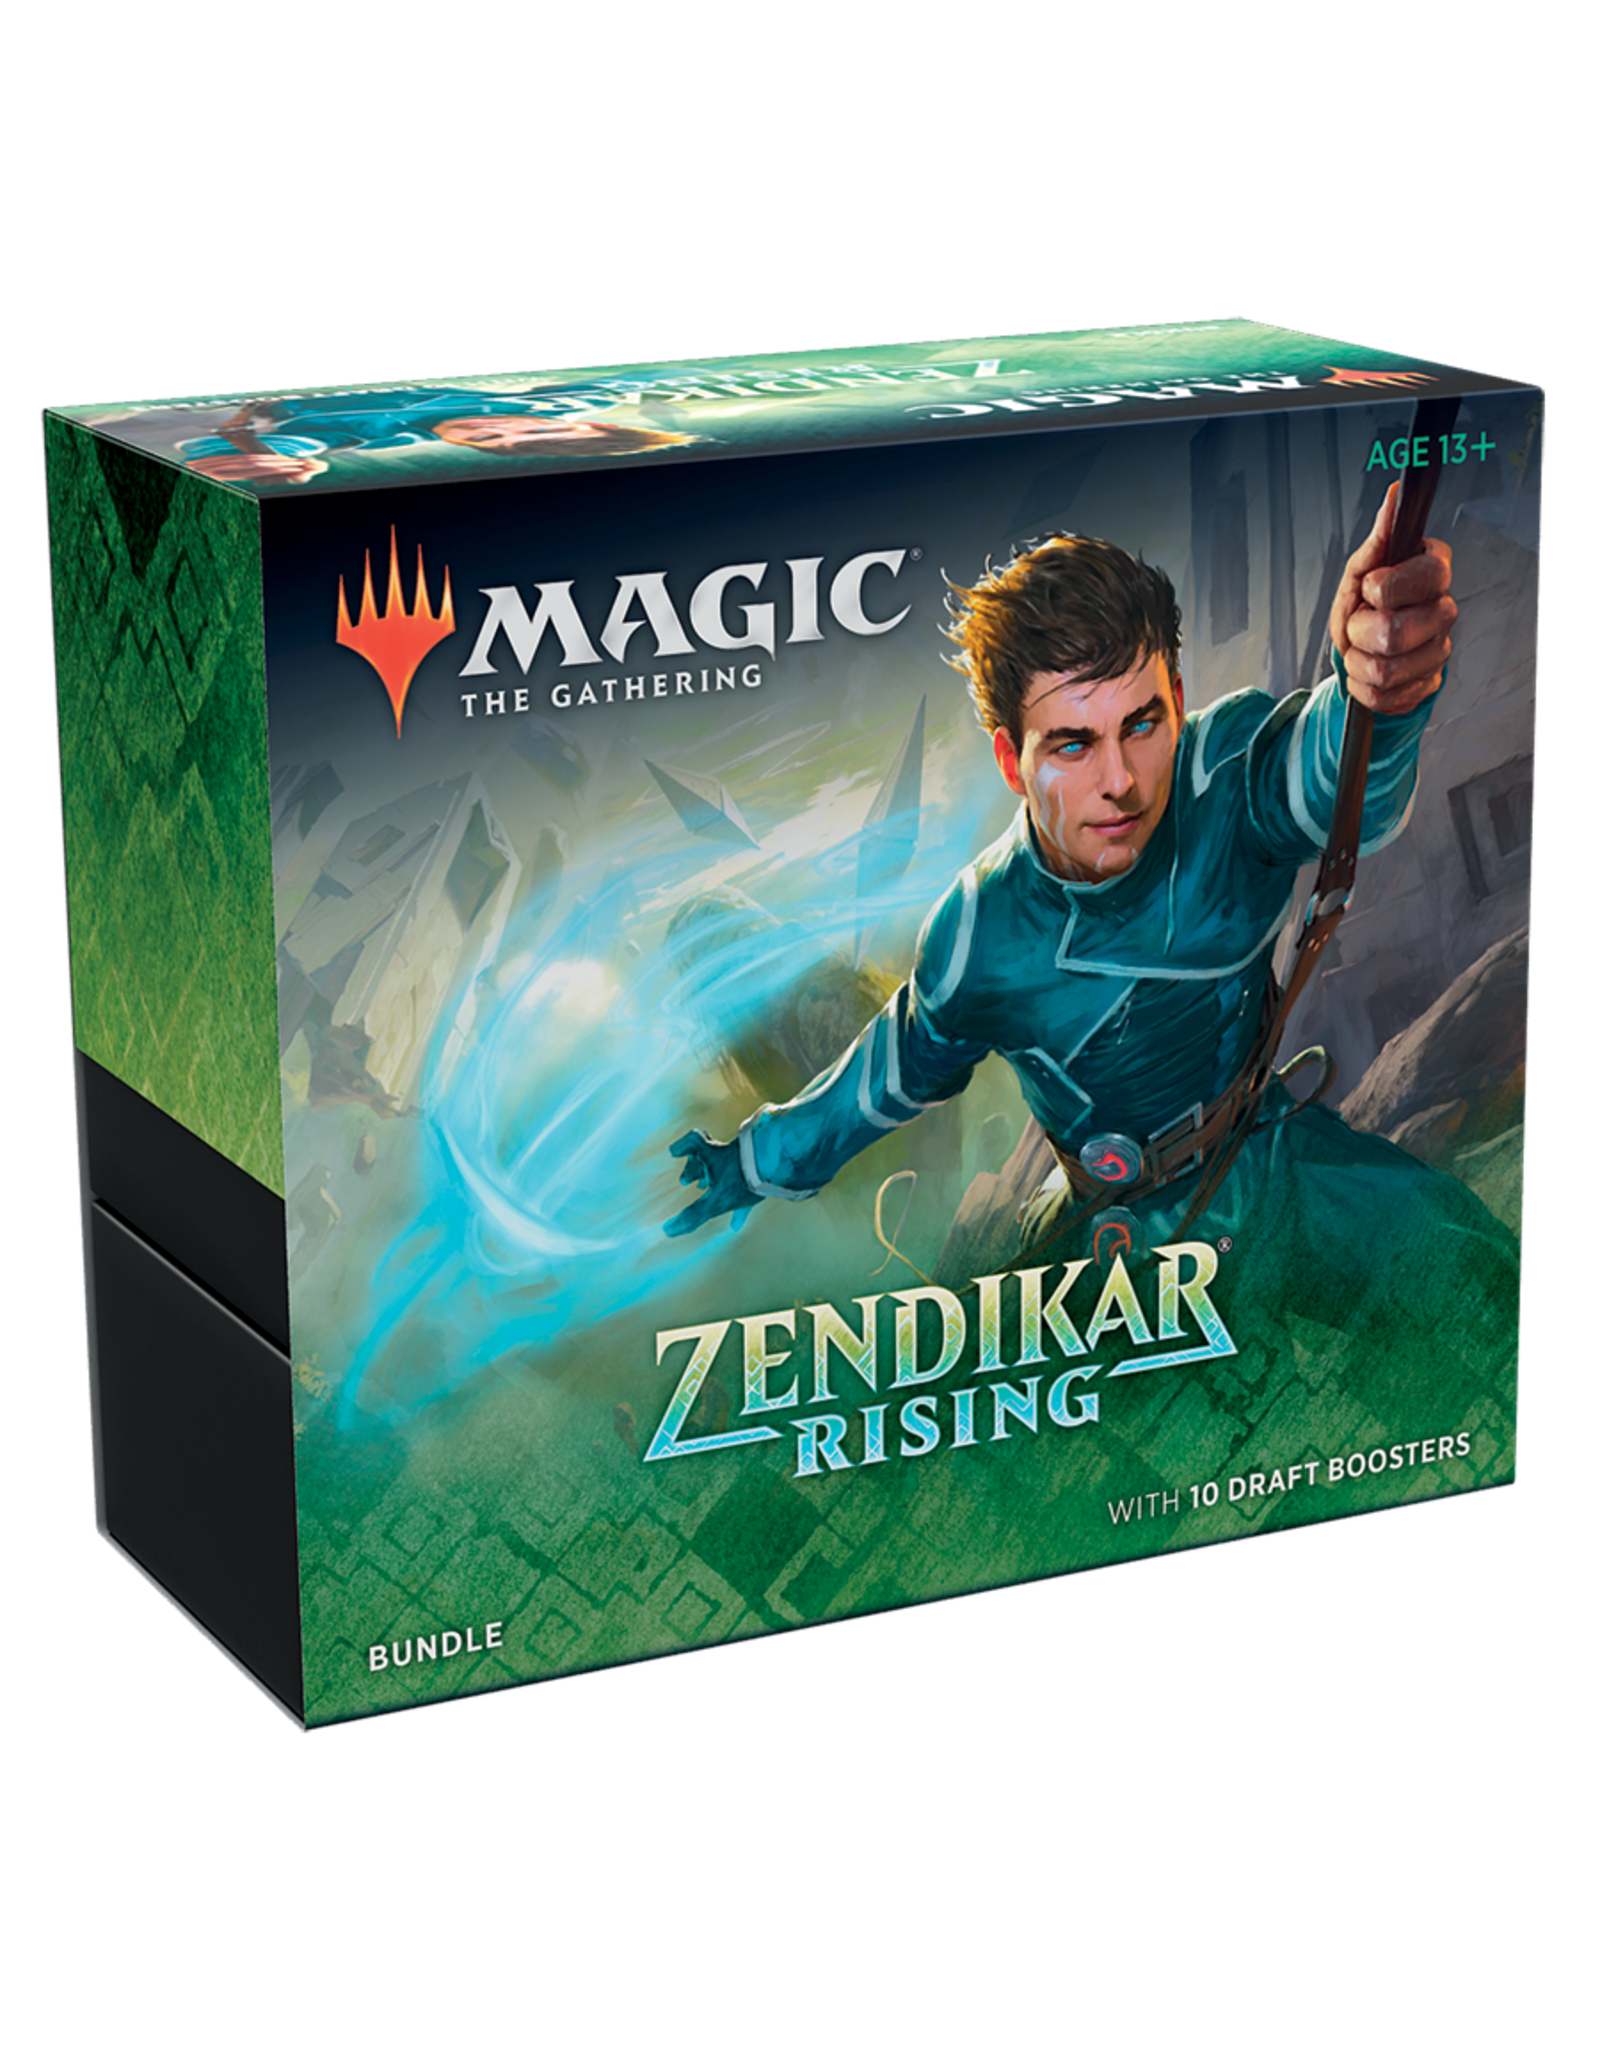 Wizards of the Coast Zendikar Rising Bundle - Preorder